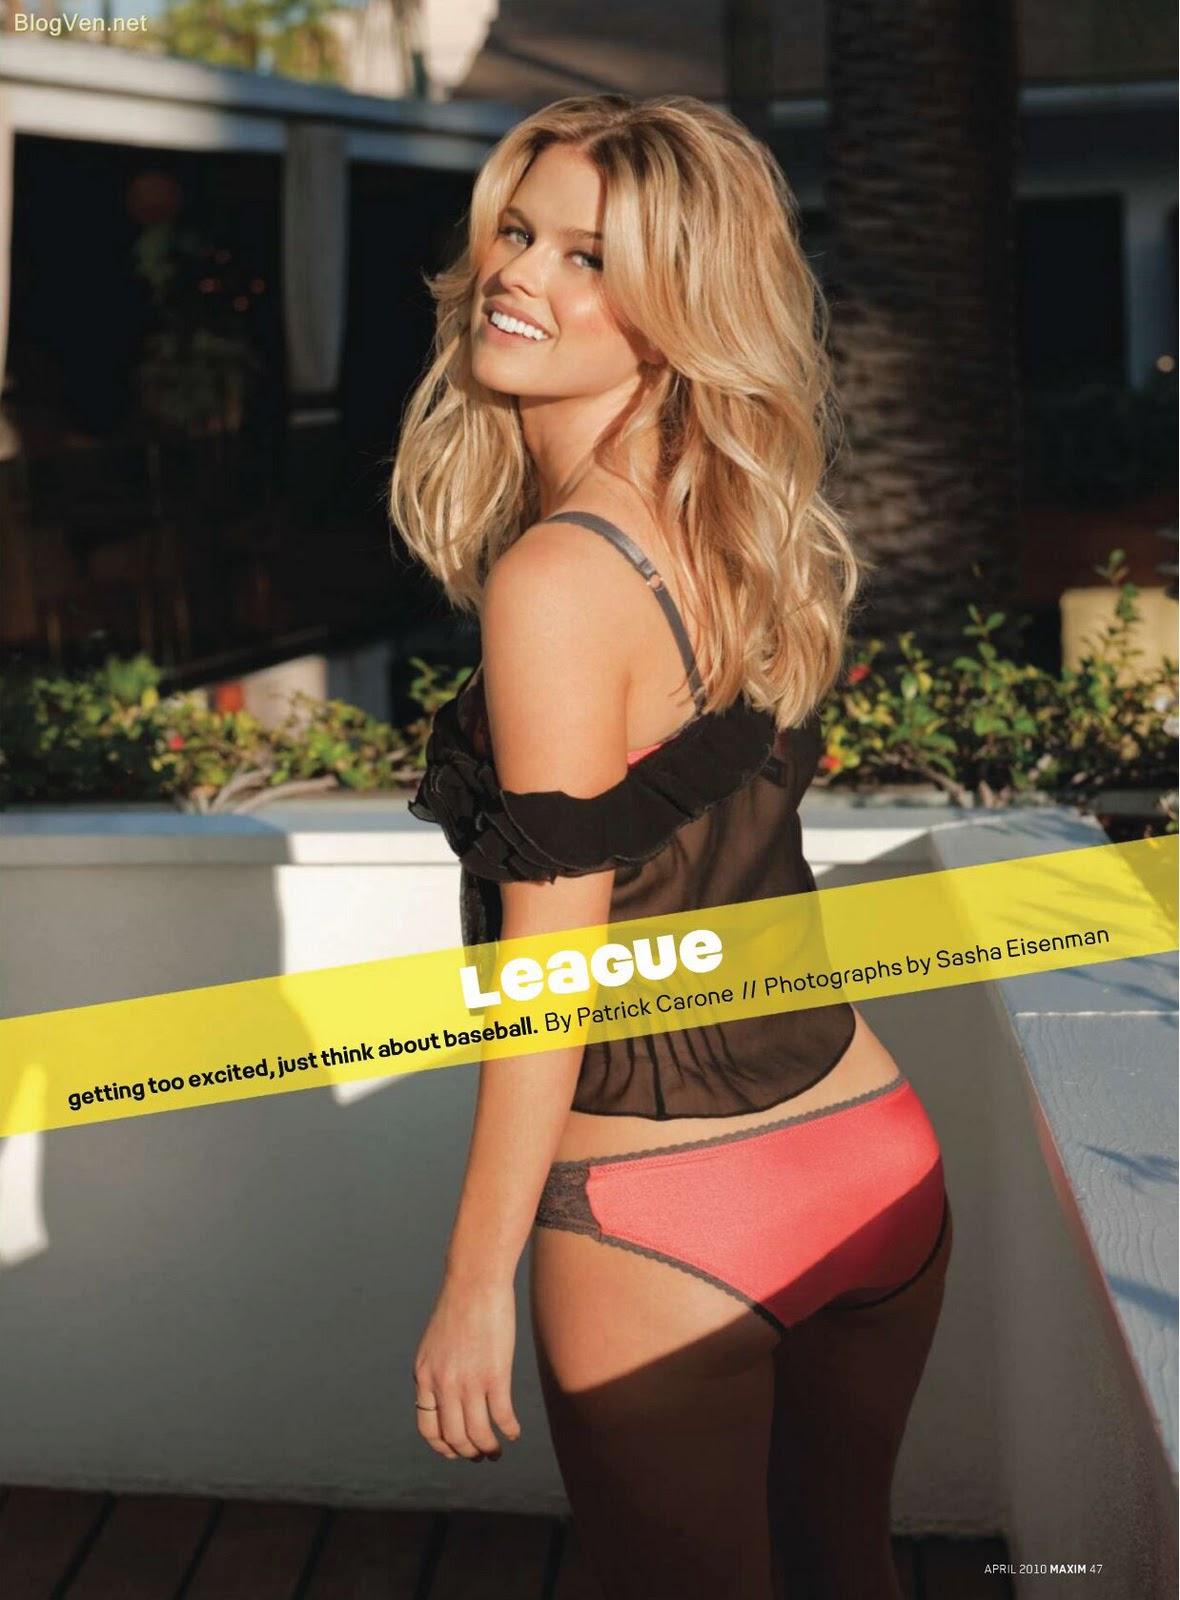 http://1.bp.blogspot.com/_o_6N8zr5RiU/TO9HBcOk6EI/AAAAAAAADD4/HCtujKg7t20/s1600/Actress_Alice_Eve_Maxim_magazine_Scans+4.jpg